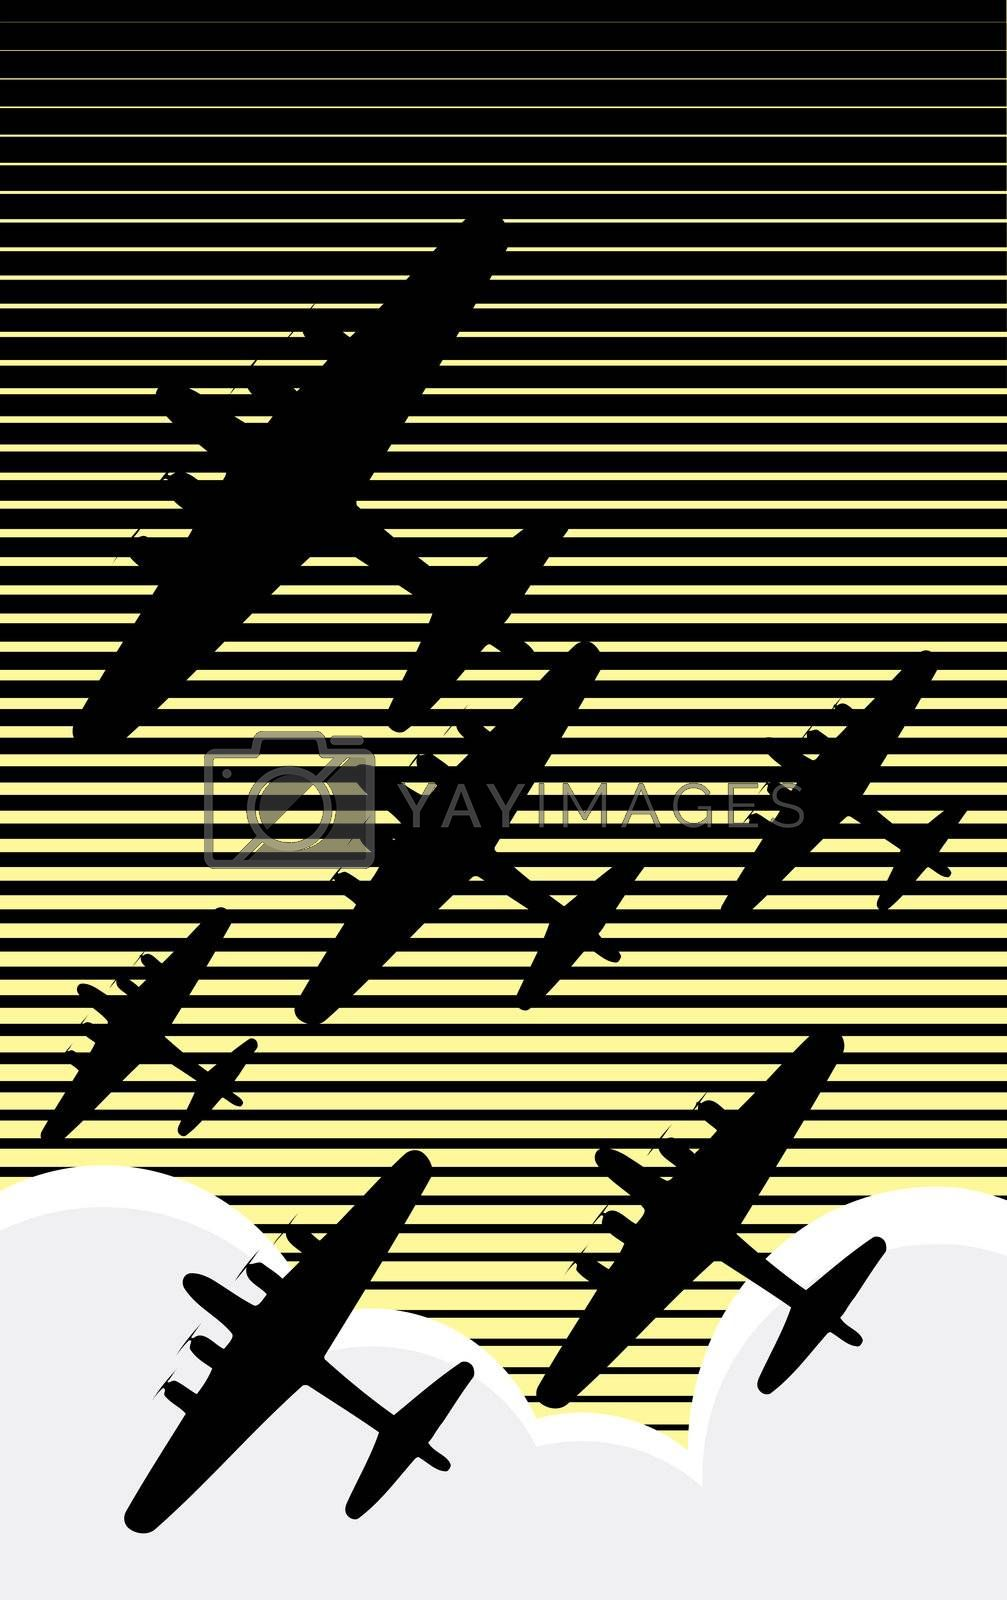 Fleet of World War II bombers against an evening sky retro poster style.